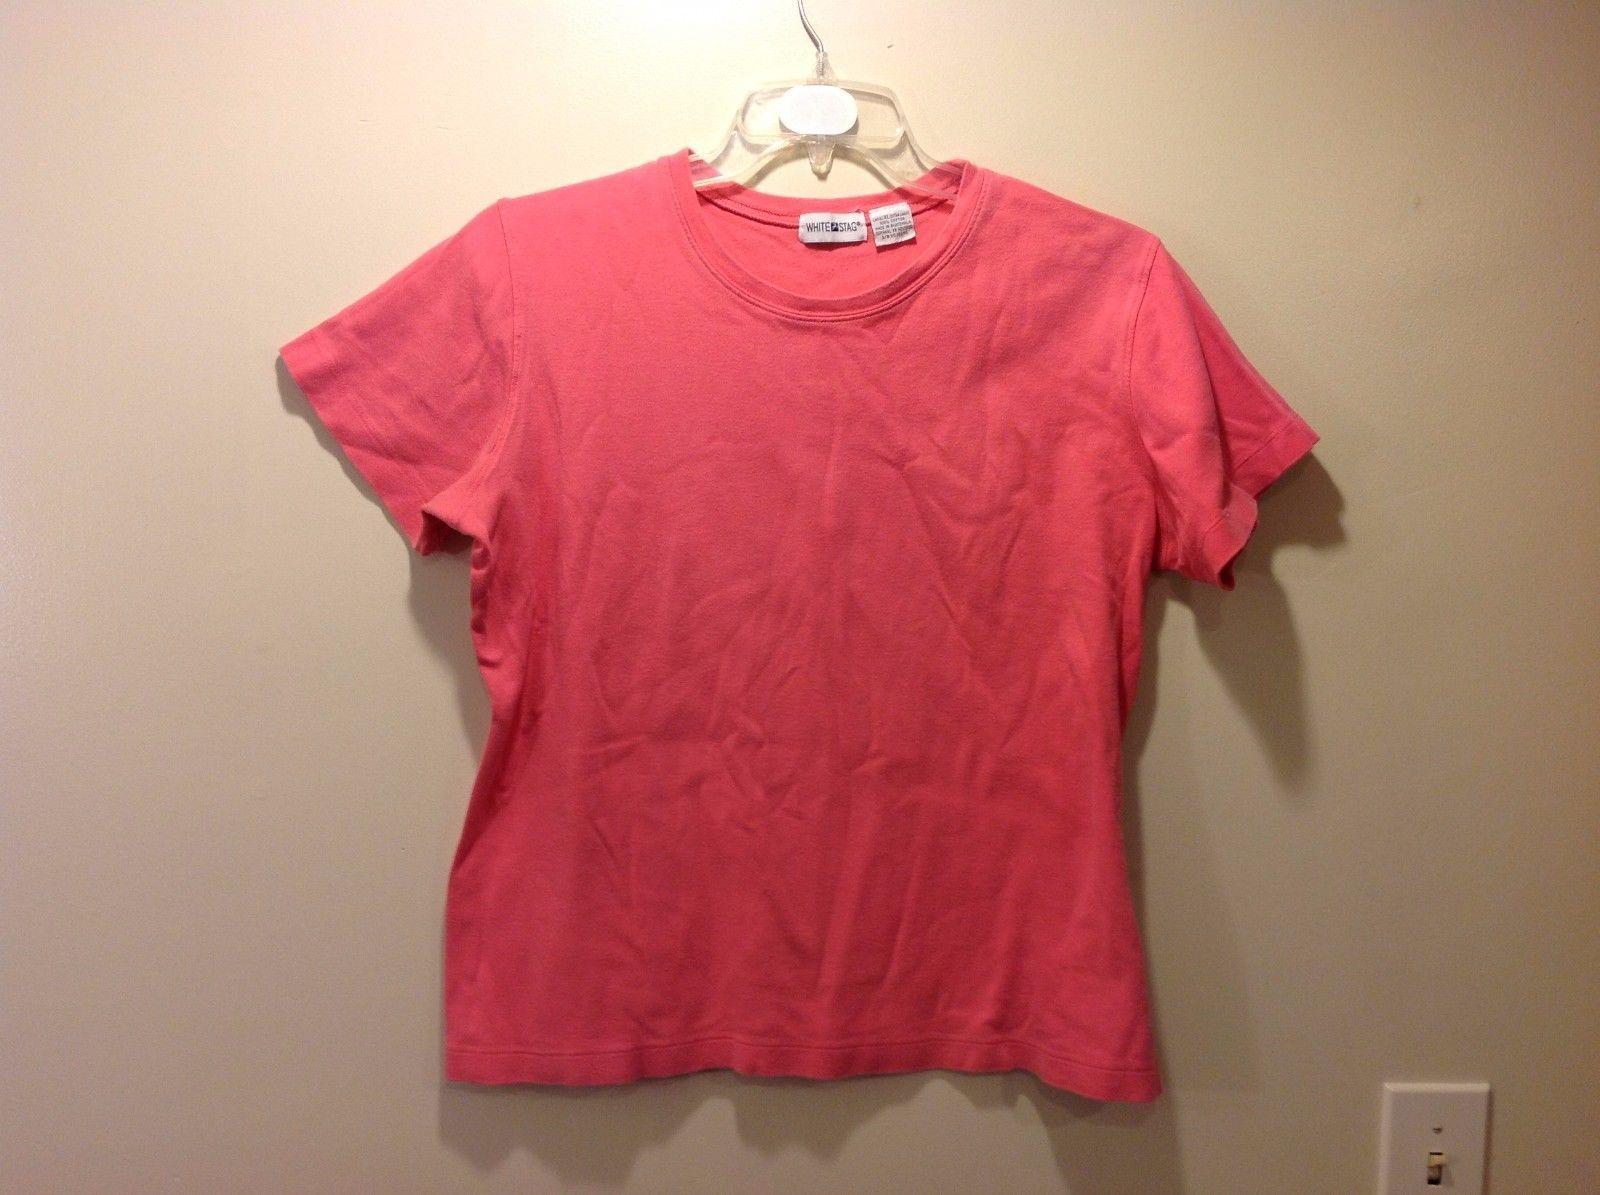 Ladies White Stag Simple Pink Short Sleeve Shirt Sz XL